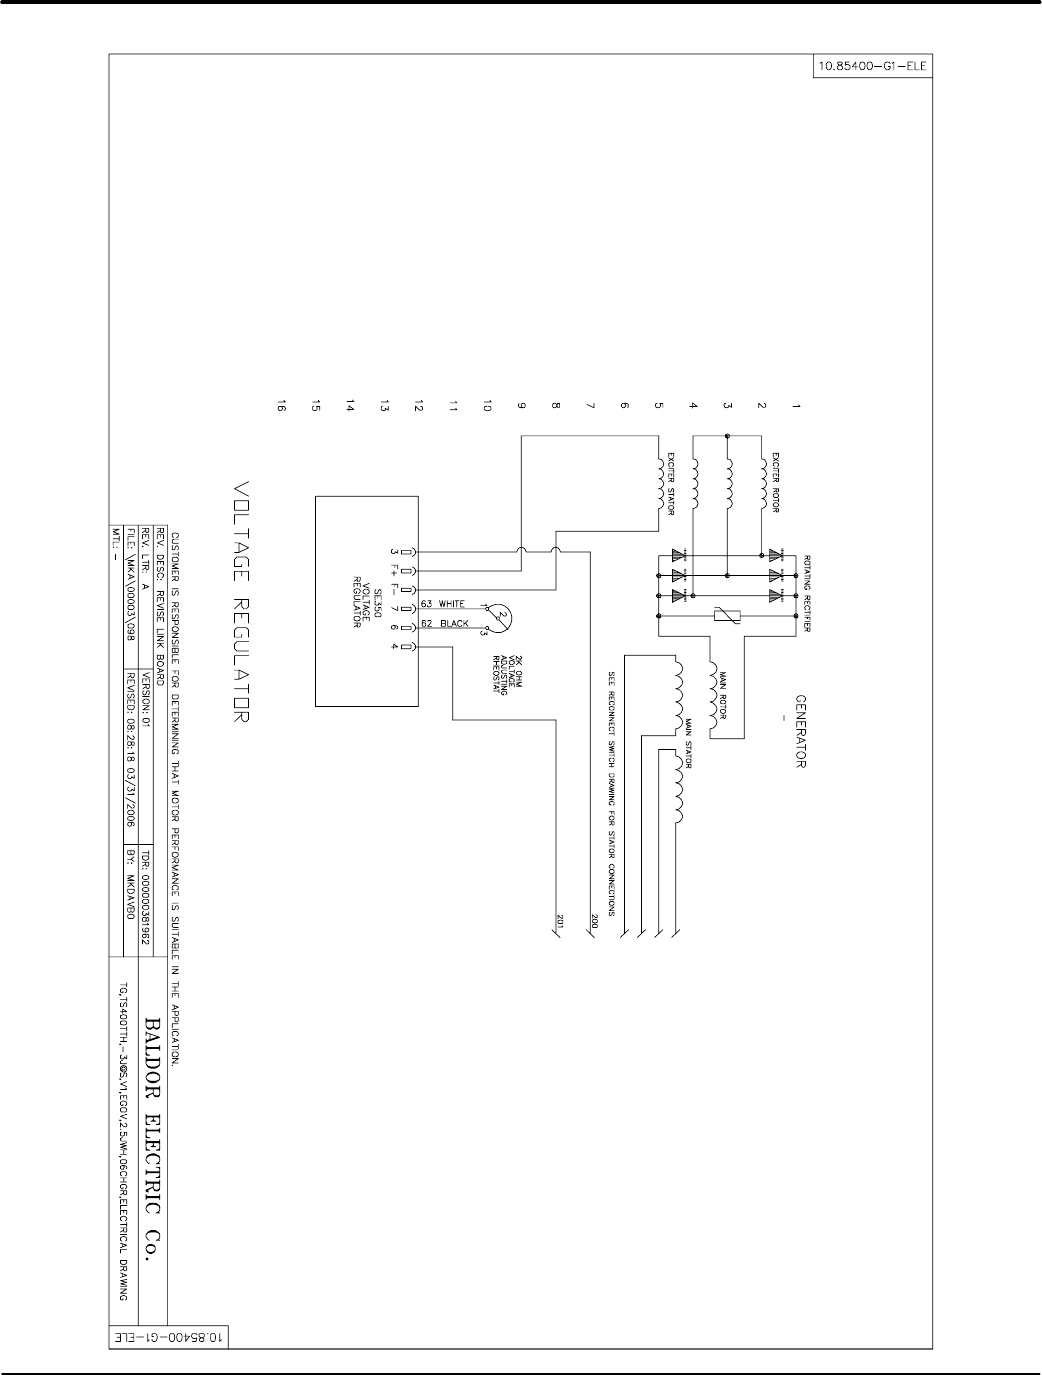 baldor ts35 mn2417 tier 2/3 towable generators user manual to the 269cee50  4d34 4586 b021 d3aaa704d829  usermanual.wiki